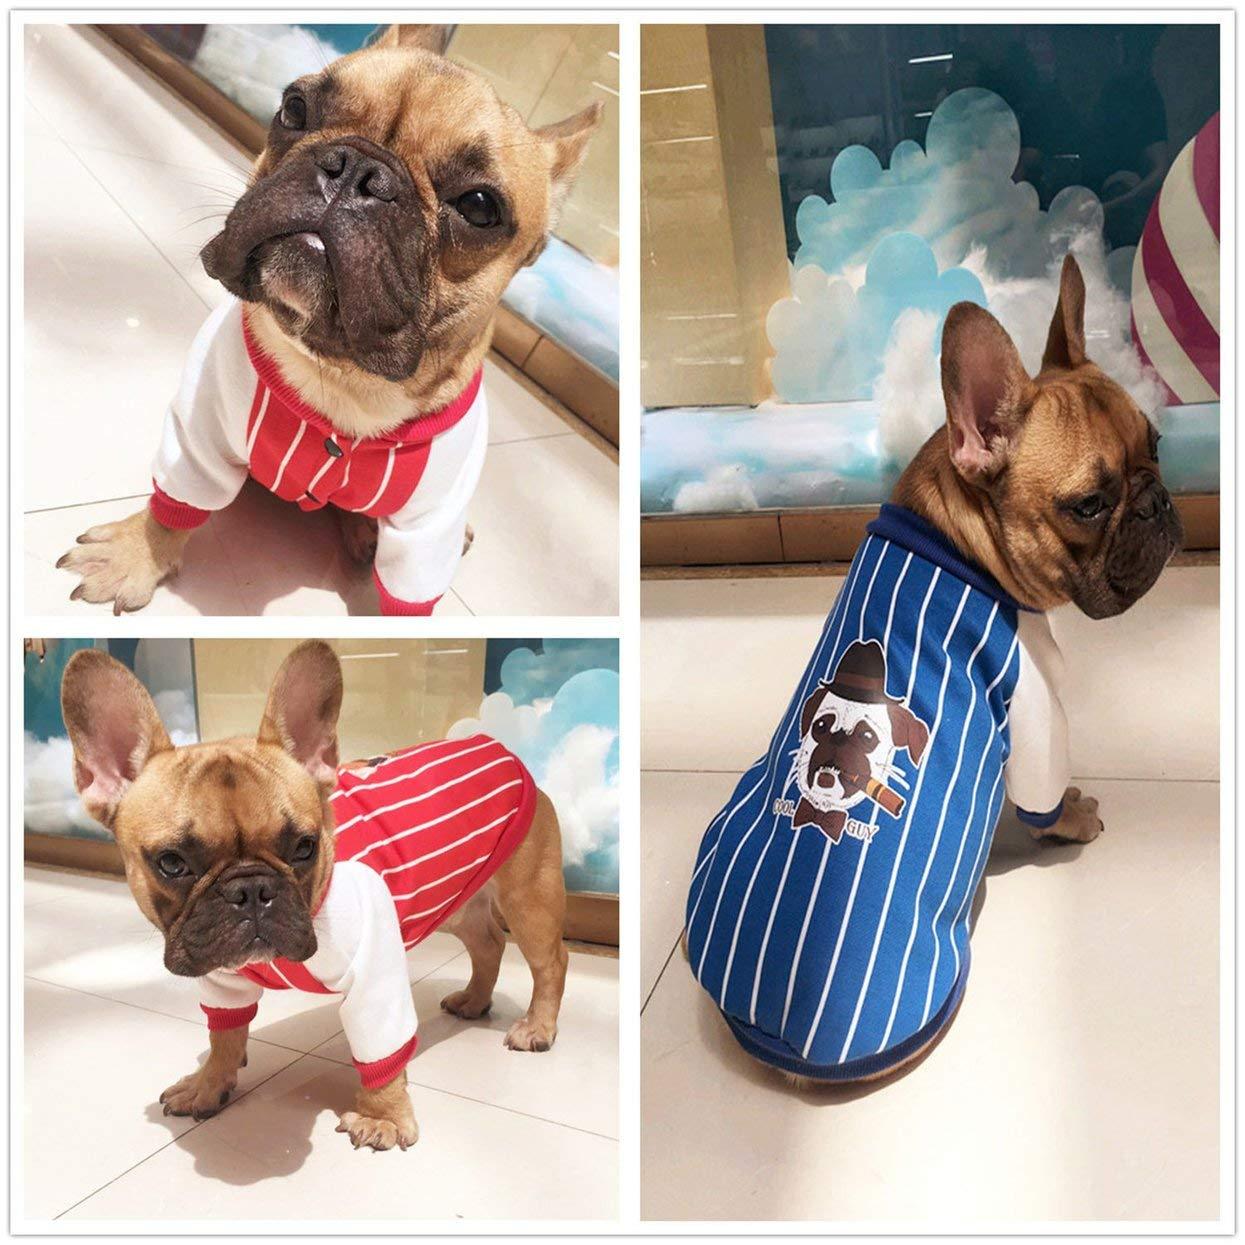 Tellaboull for Patrón de Rayas Bulldog francés Ropa para Mascotas Ropa de Perro para Mascotas Cuello de Cuatro Patas Sudaderas para Perros Abrigos Cachorros ...